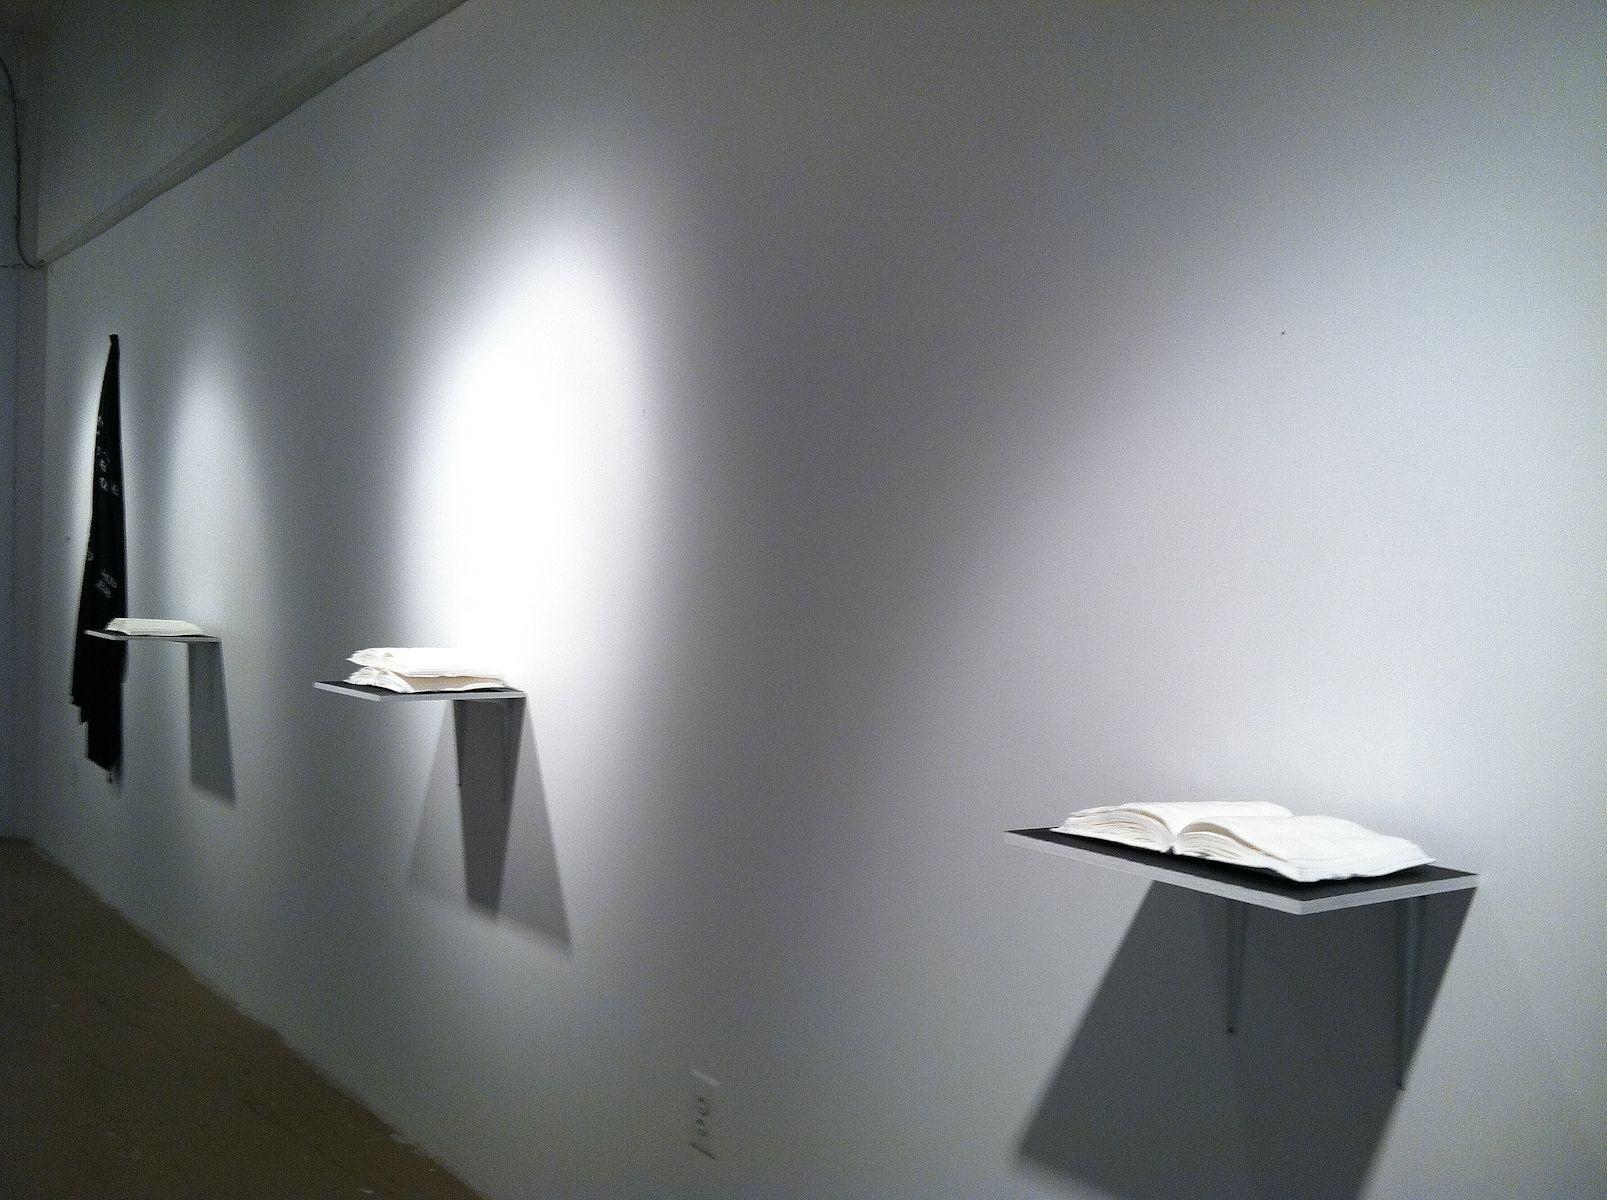 Monuments of Language IV Installation